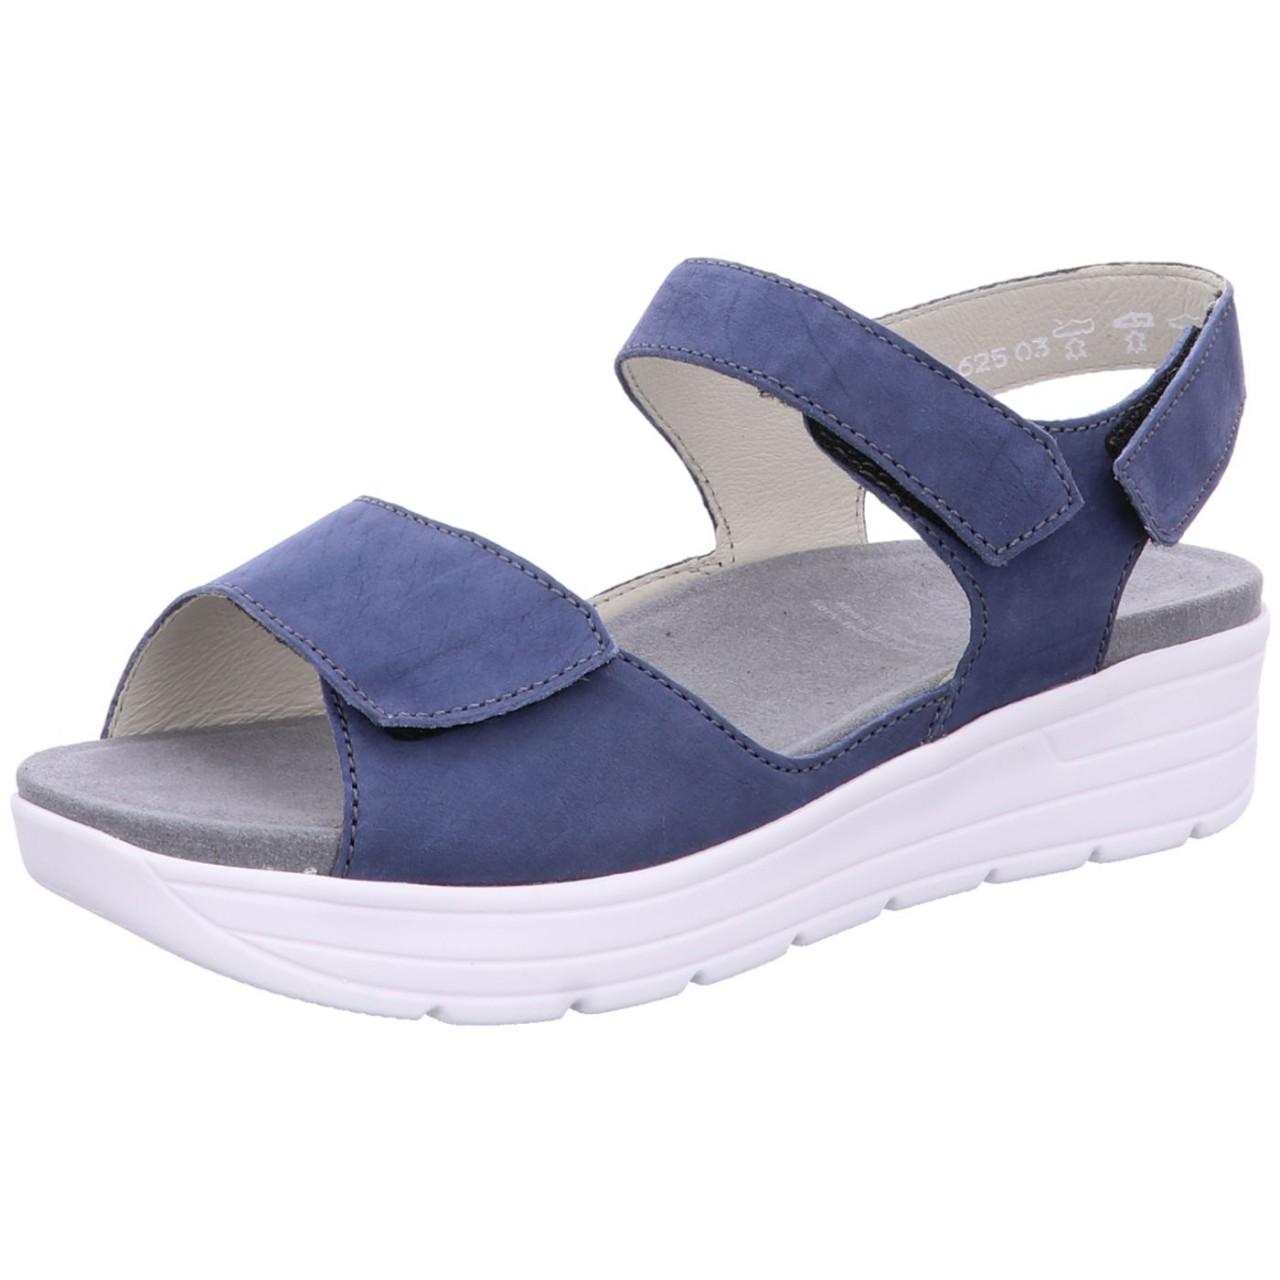 Solidus Sandale Greta Blau blue 48000 80008